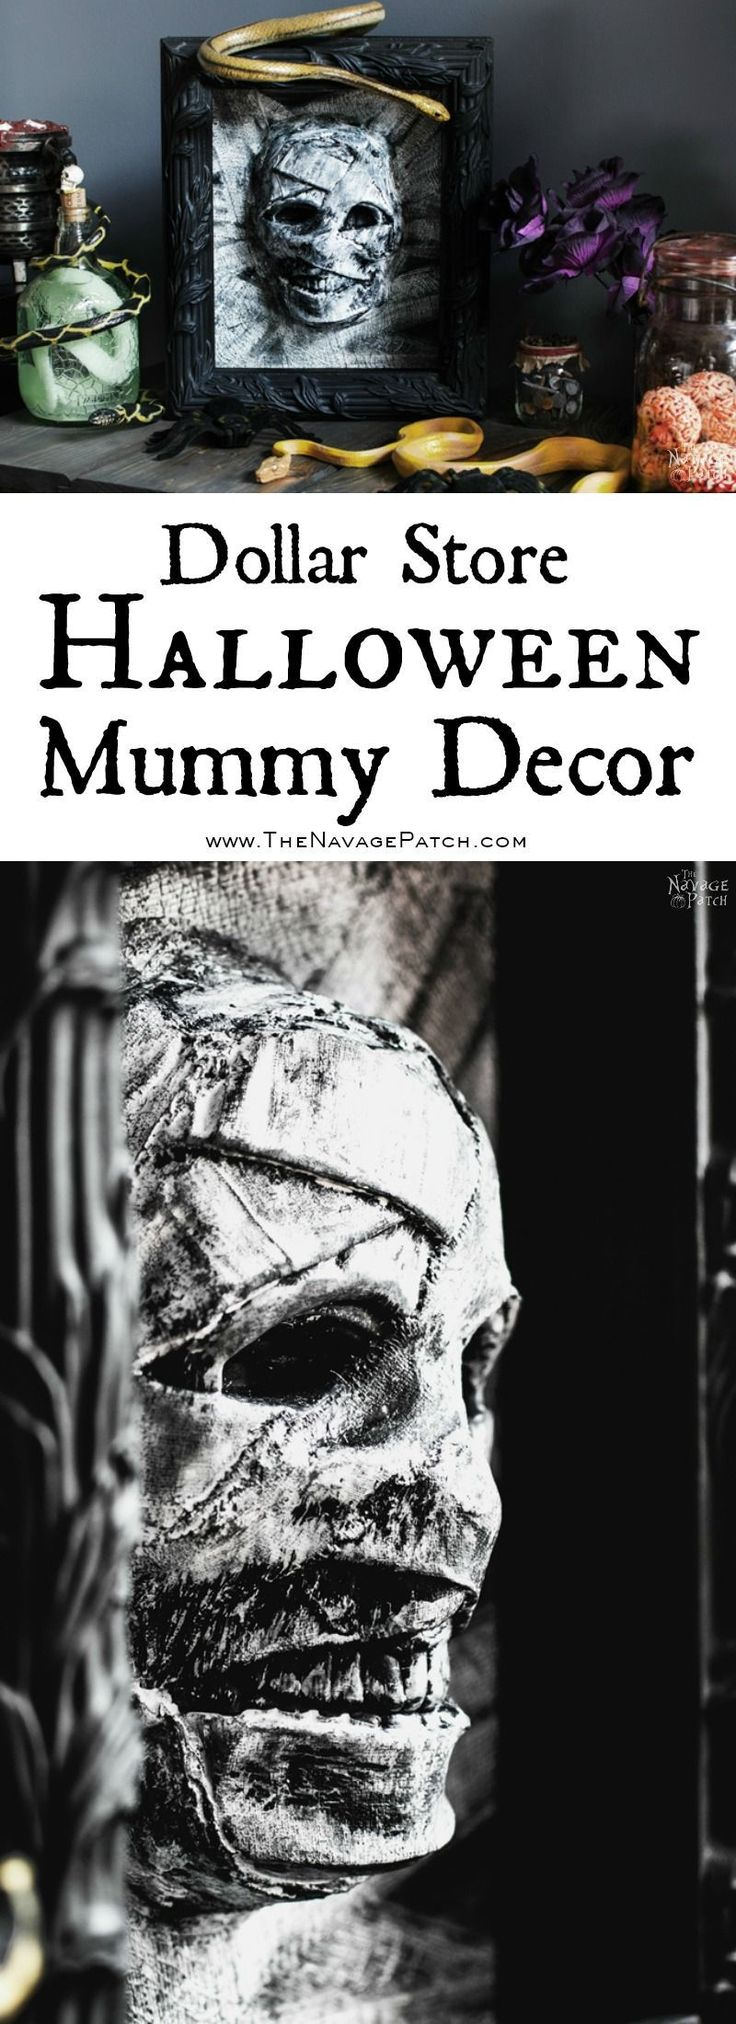 Dollar Store Halloween Mummy Decor | DIY Halloween decor | Dollar store crafts | Gothic decor for Halloween | Easy & budget crafts | DIY Halloween prop | Spooky and gothic decor | Upcycled Halloween decor | TheNavagePatch.com